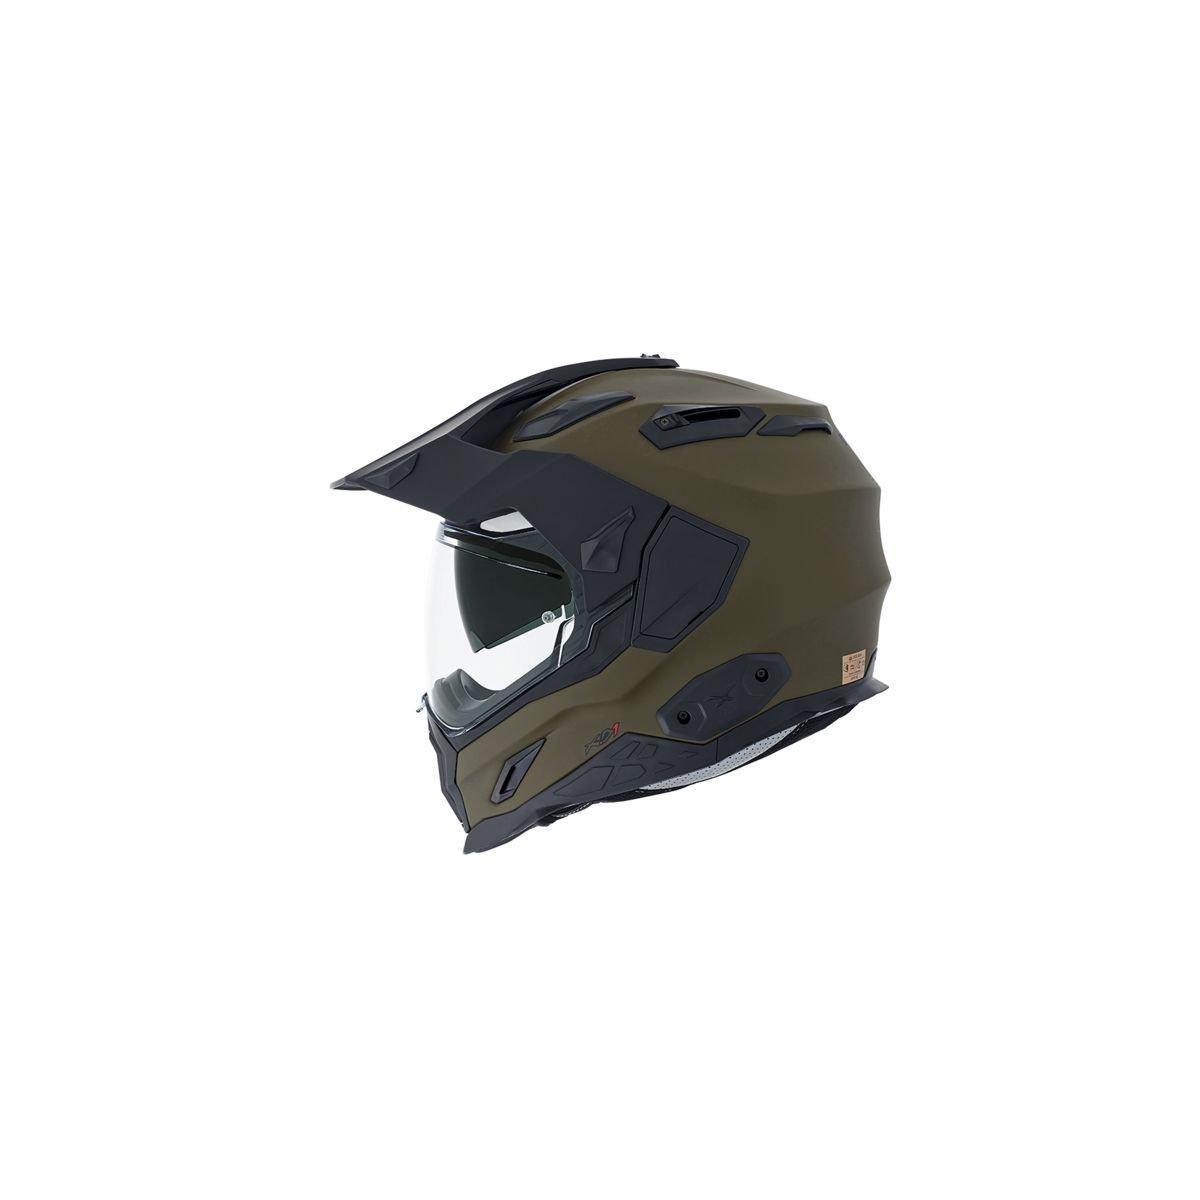 Casco Nexx integral x.d1 Plain - M - Sierra -: Nexx Helmets: Amazon.es: Coche y moto